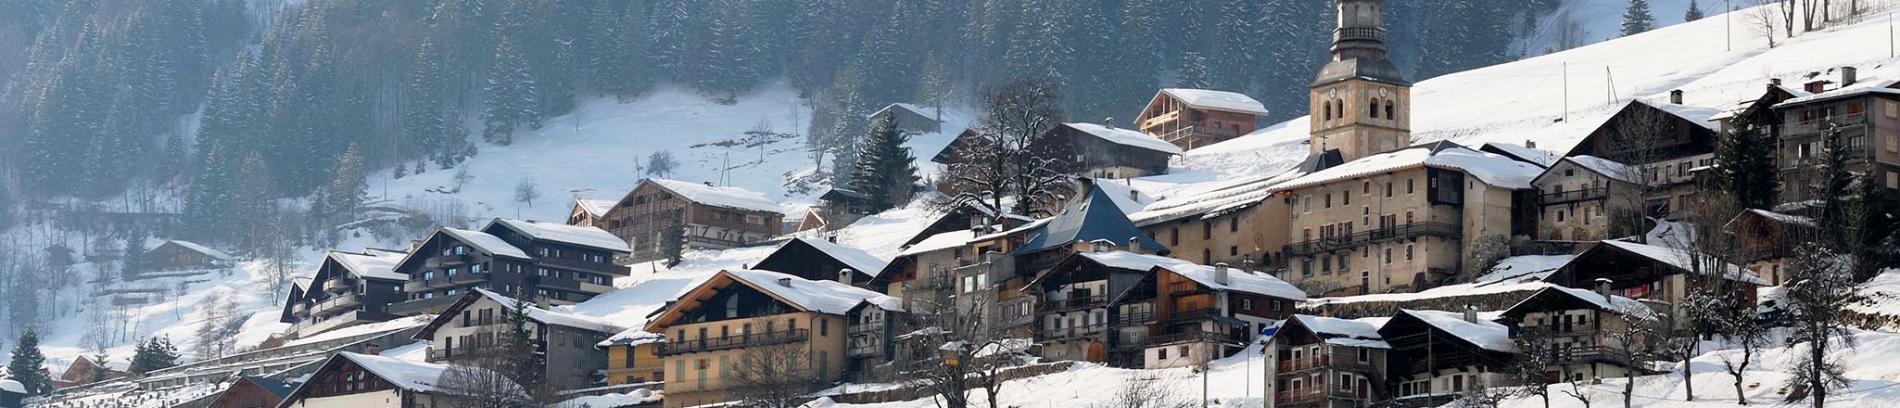 Slide Le village